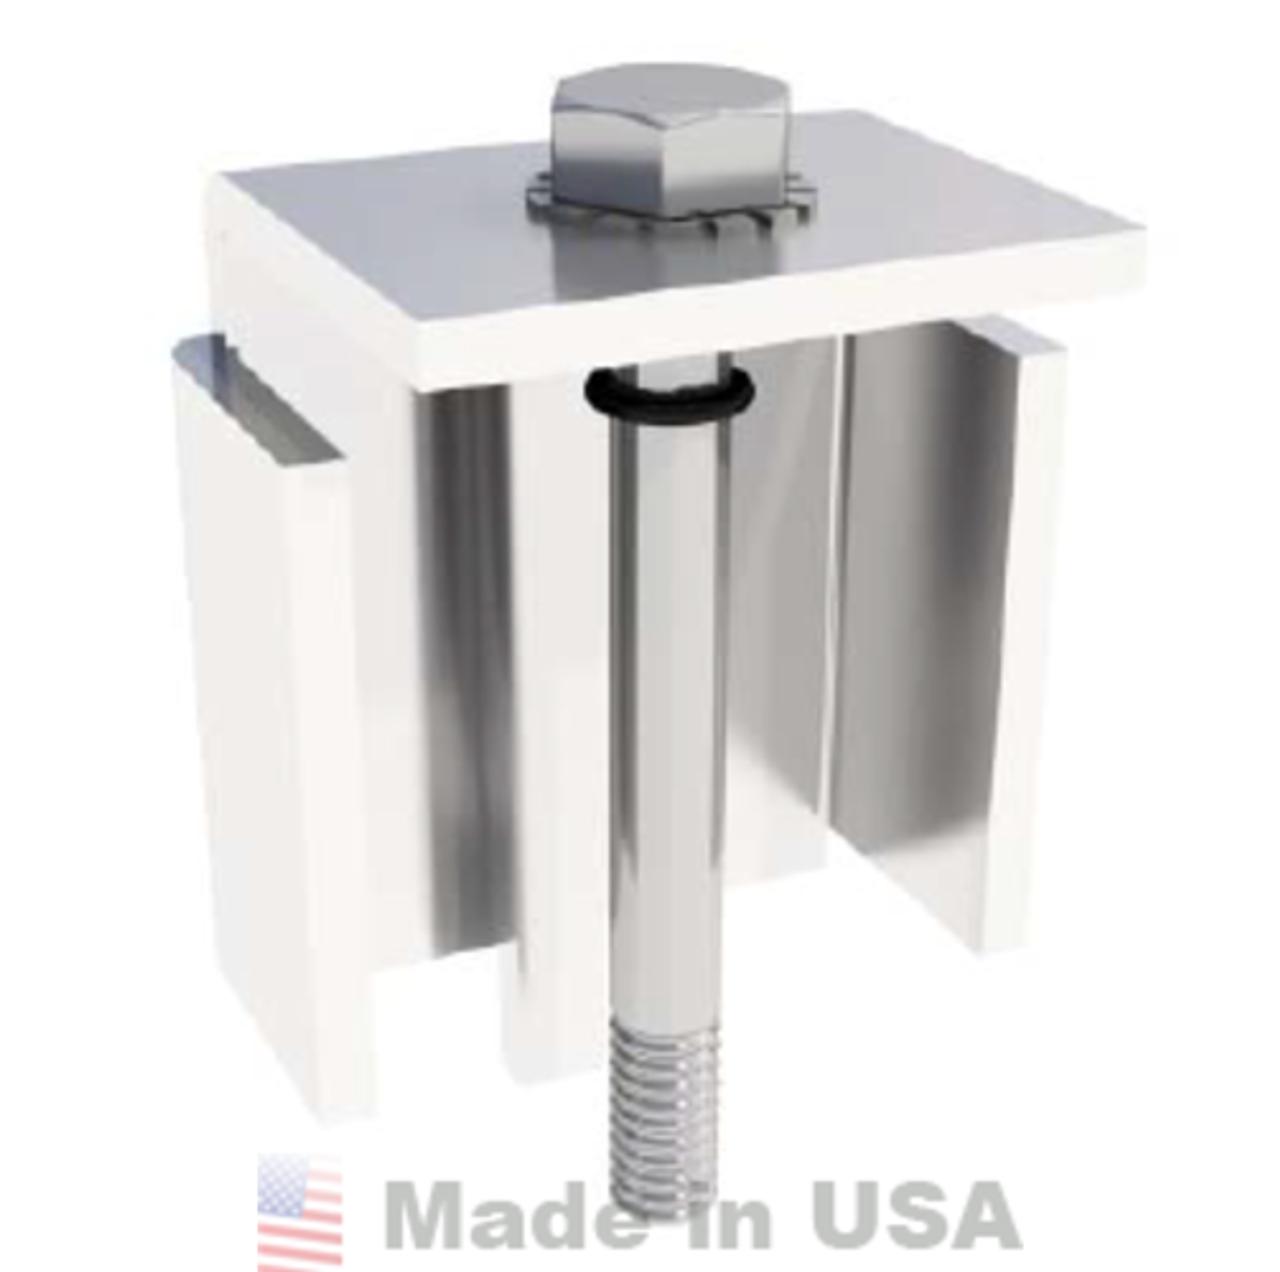 IronRidge BRM Ballast Module Clamp (Fits 41.5mm - 42.4mm)